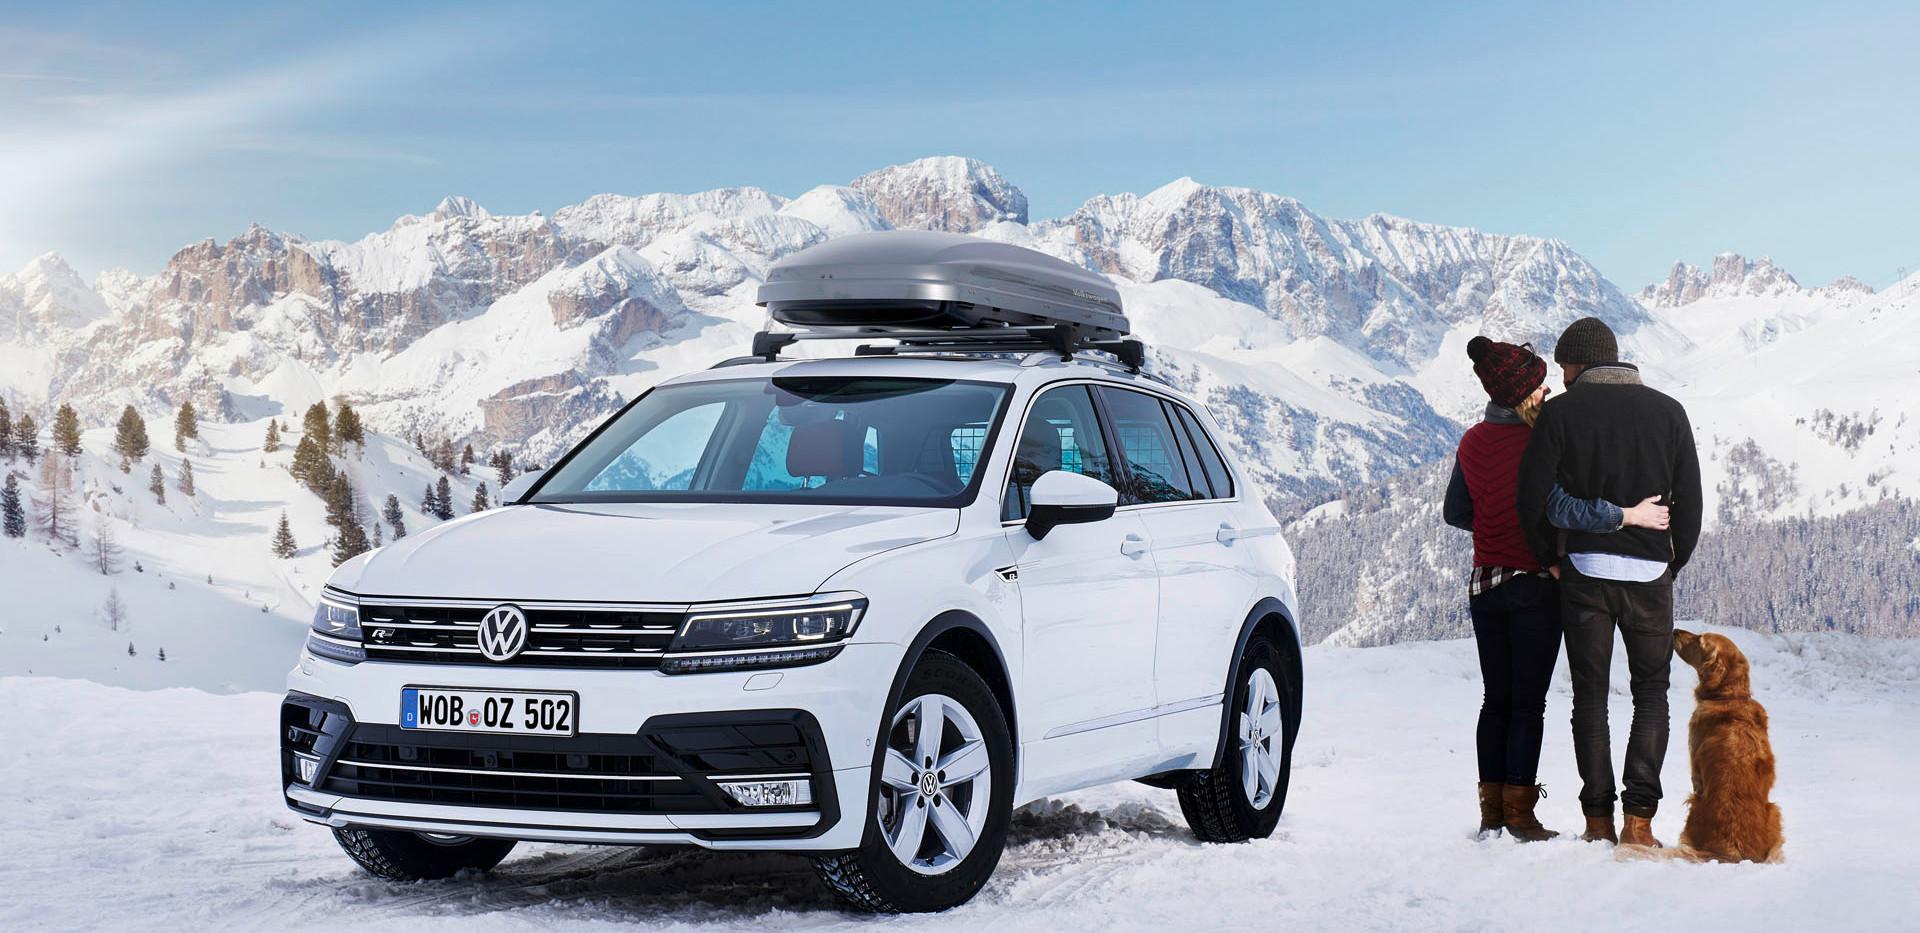 VW_Winterzubehör_2016_3.jpg